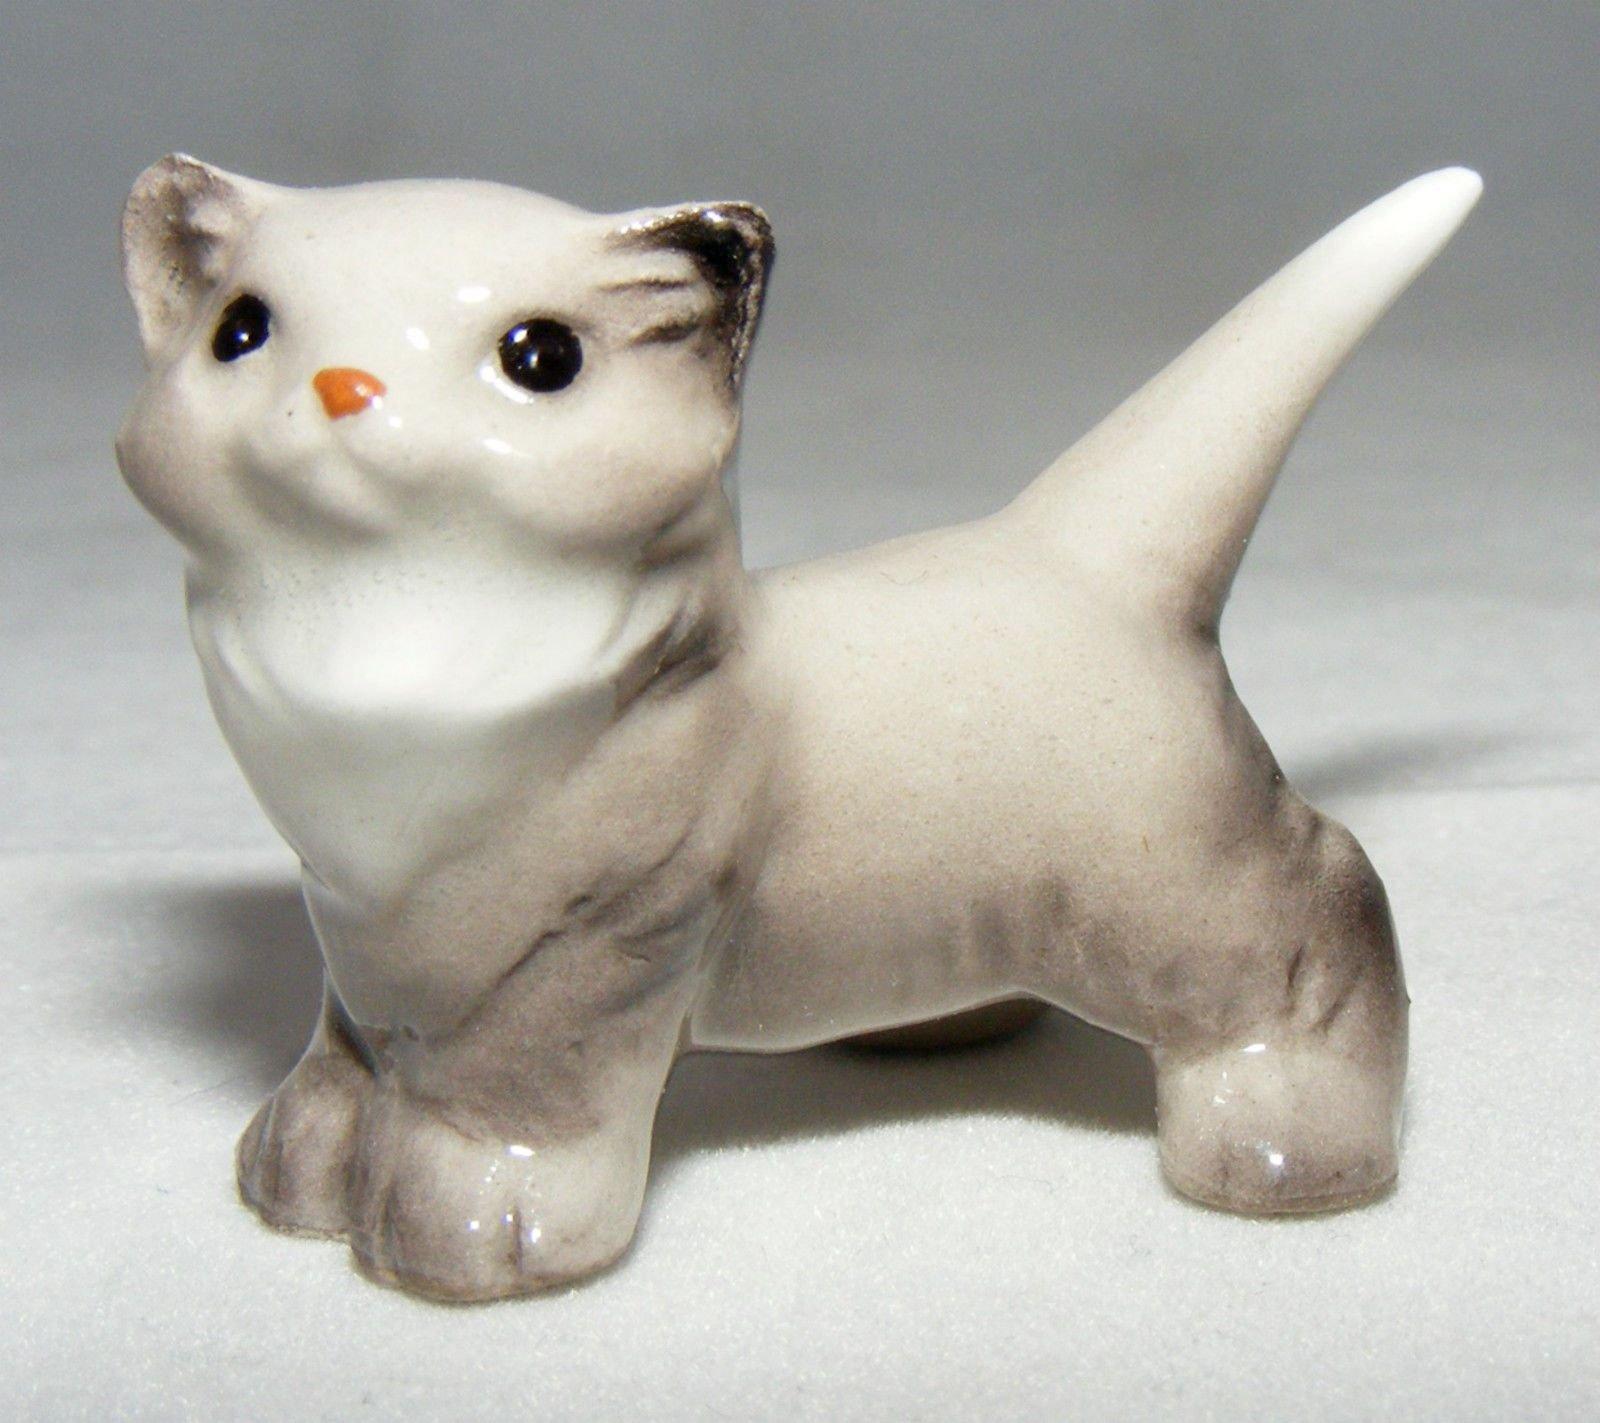 Hagen-Renaker Miniature Ceramic Animal Figure Kitten Sitting Up 4032